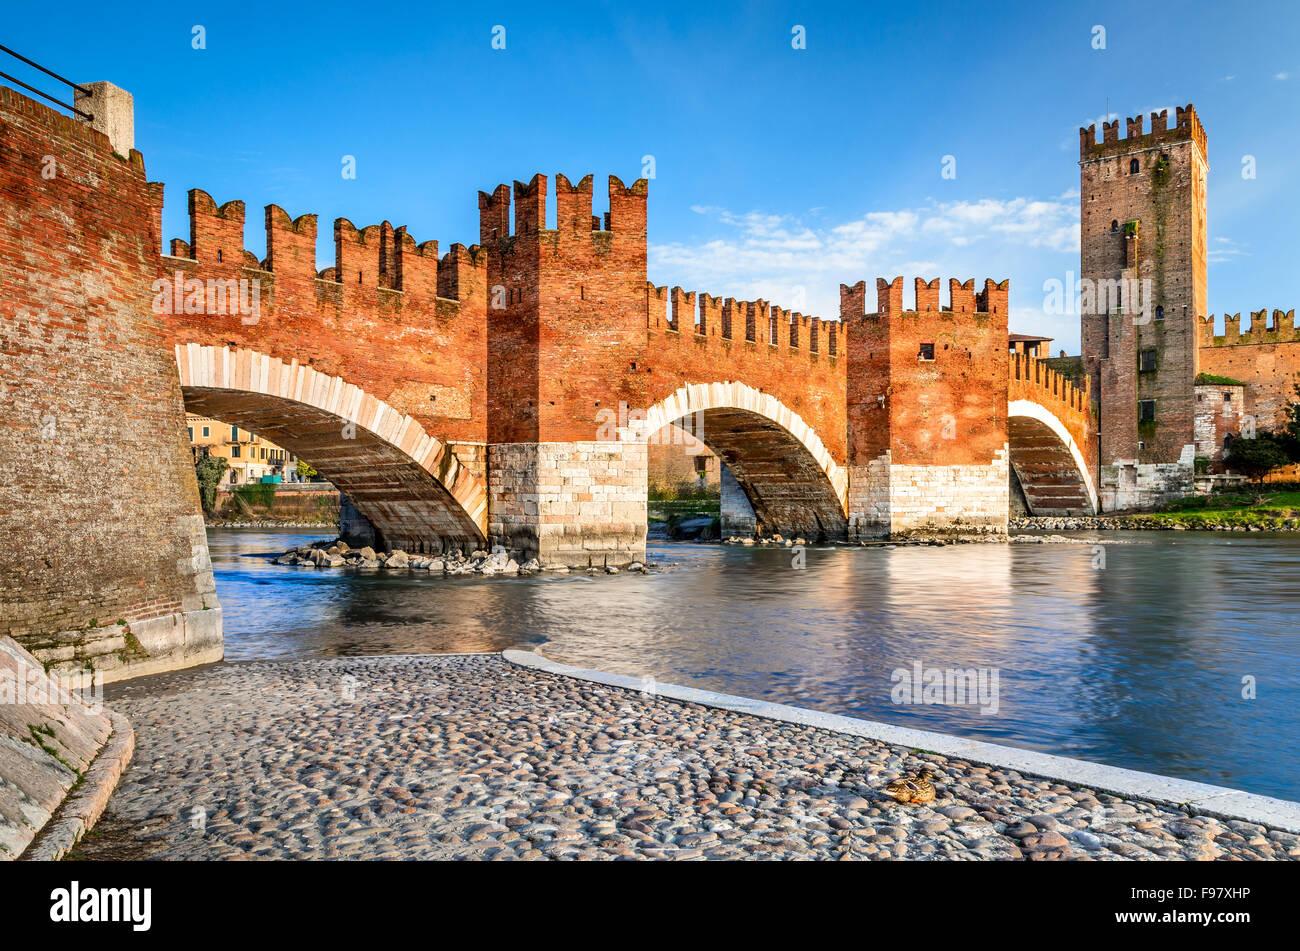 Verona, Italy. Scenery with Adige River and Ponte Scaligero and Castelvecchio, medieval landmarks of veronese city. - Stock Image